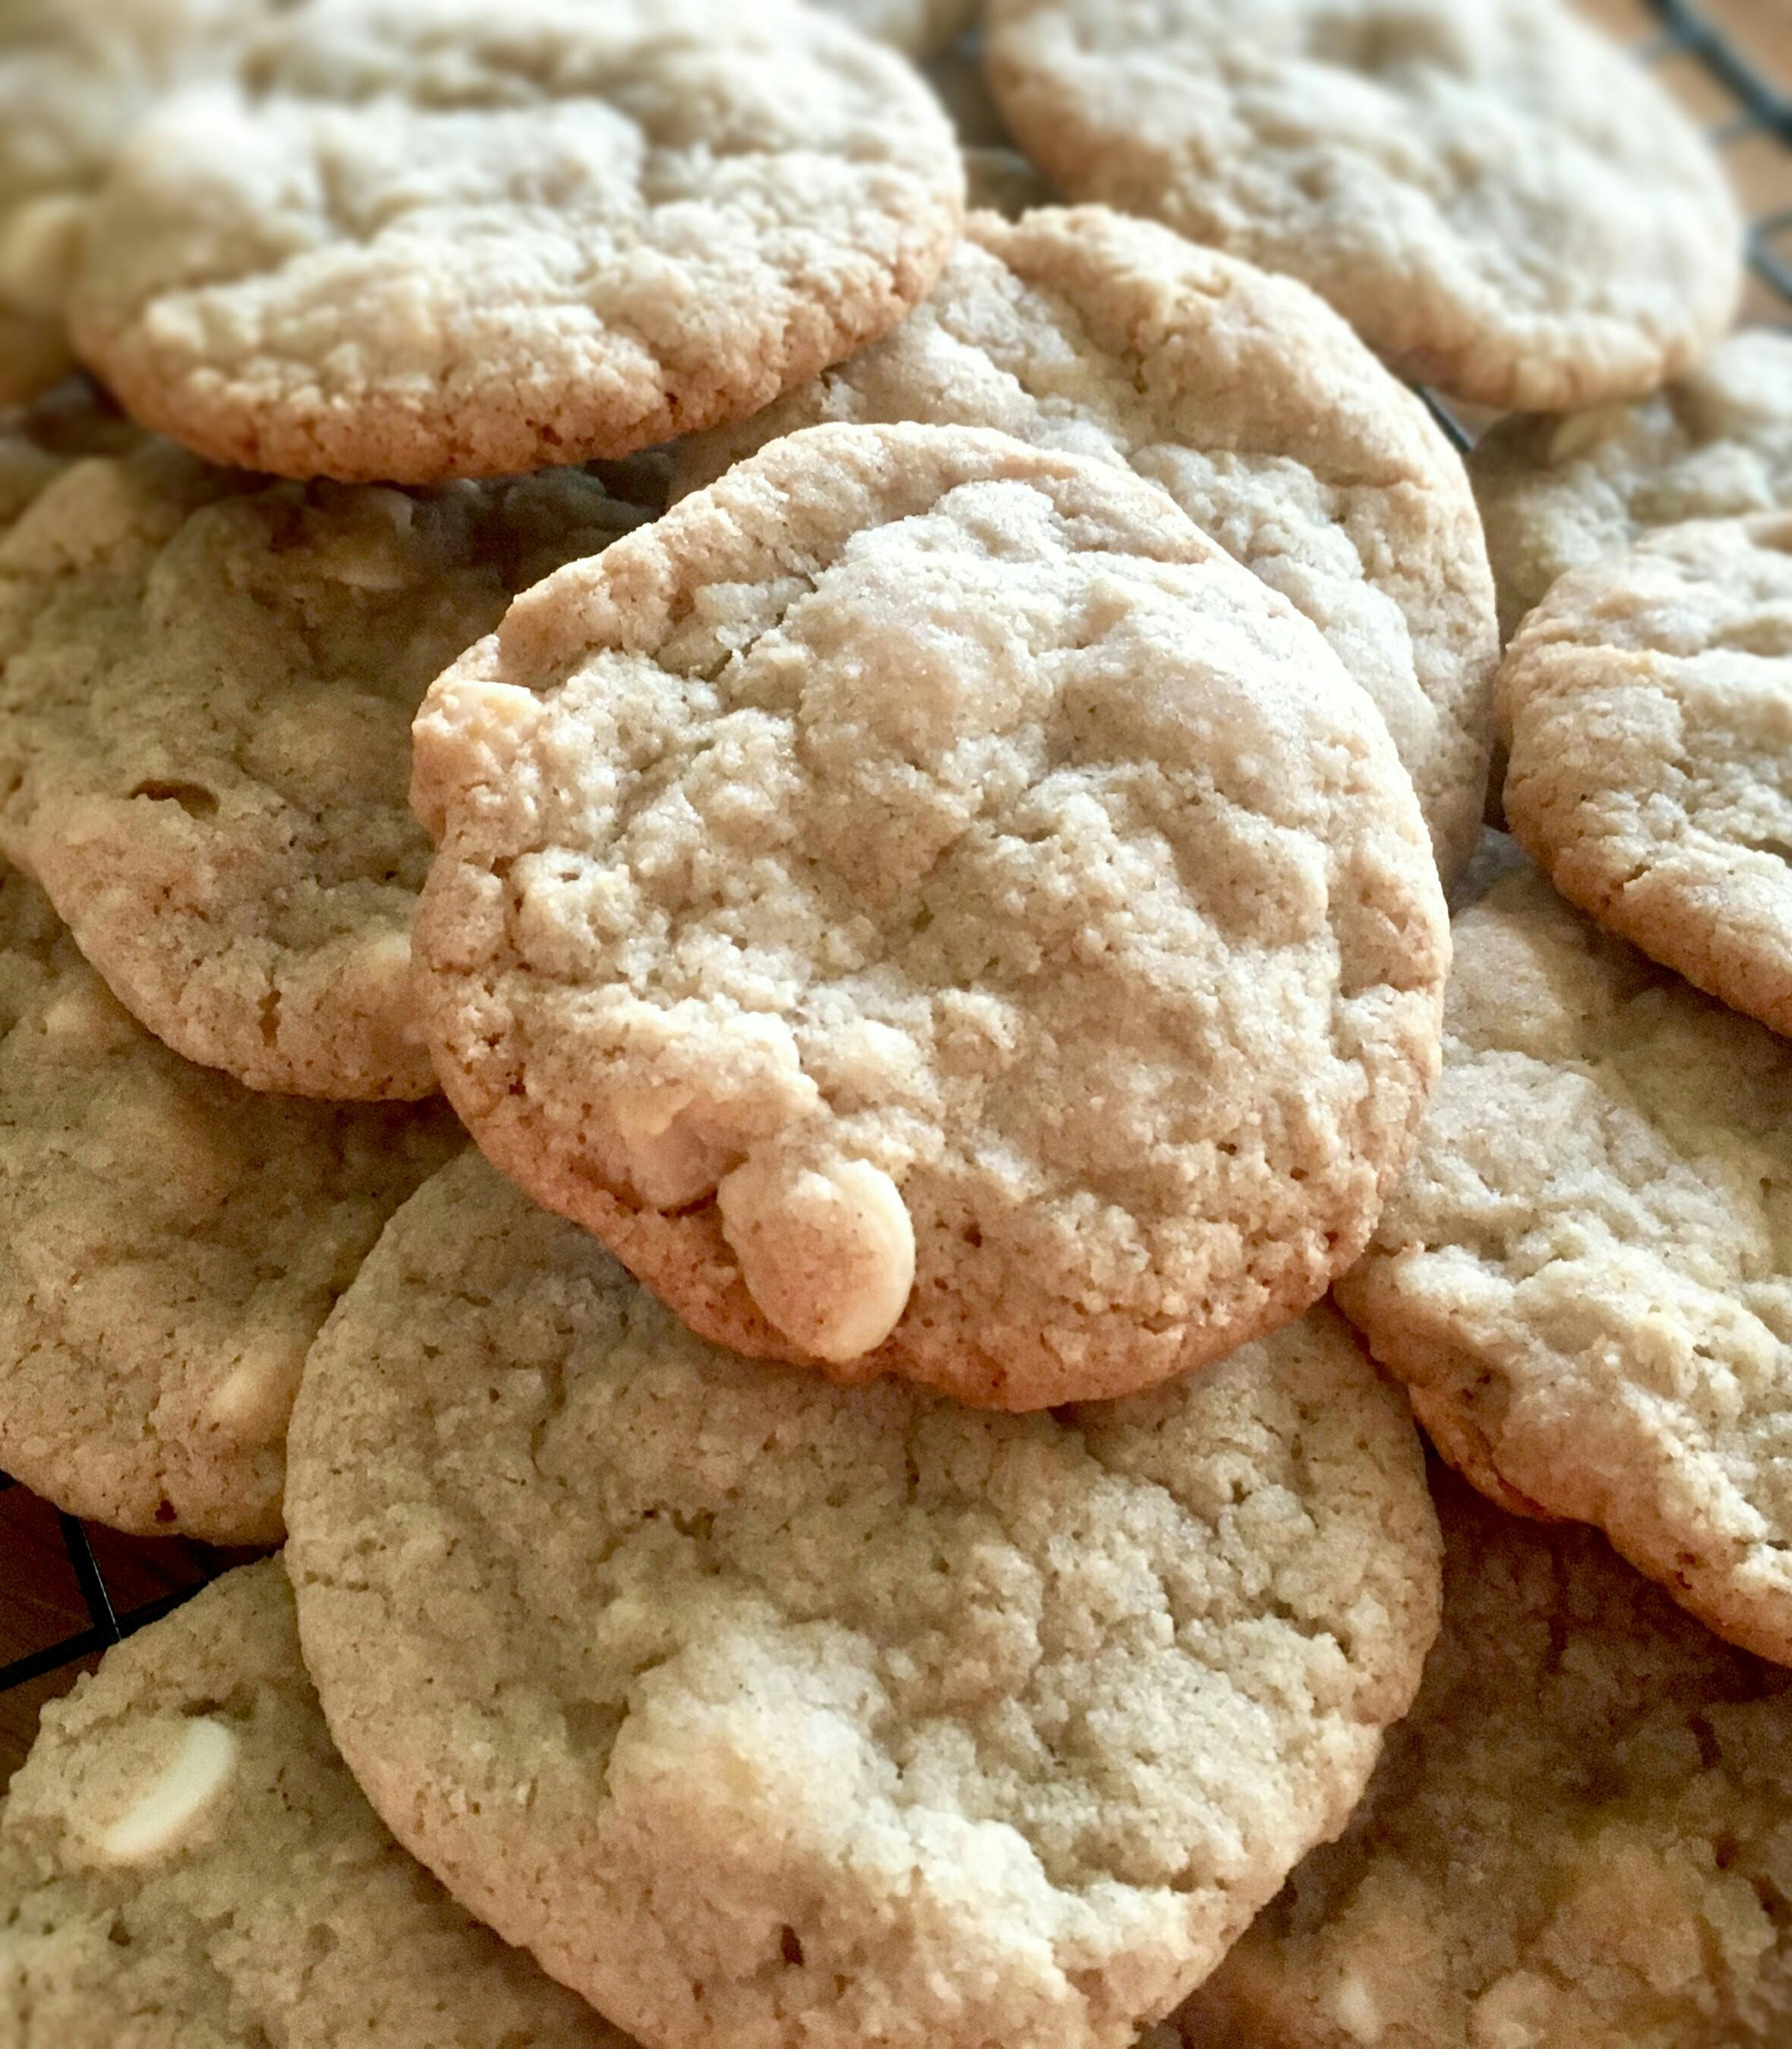 White Chocolate and Macadamia Nut Cookies Yoly